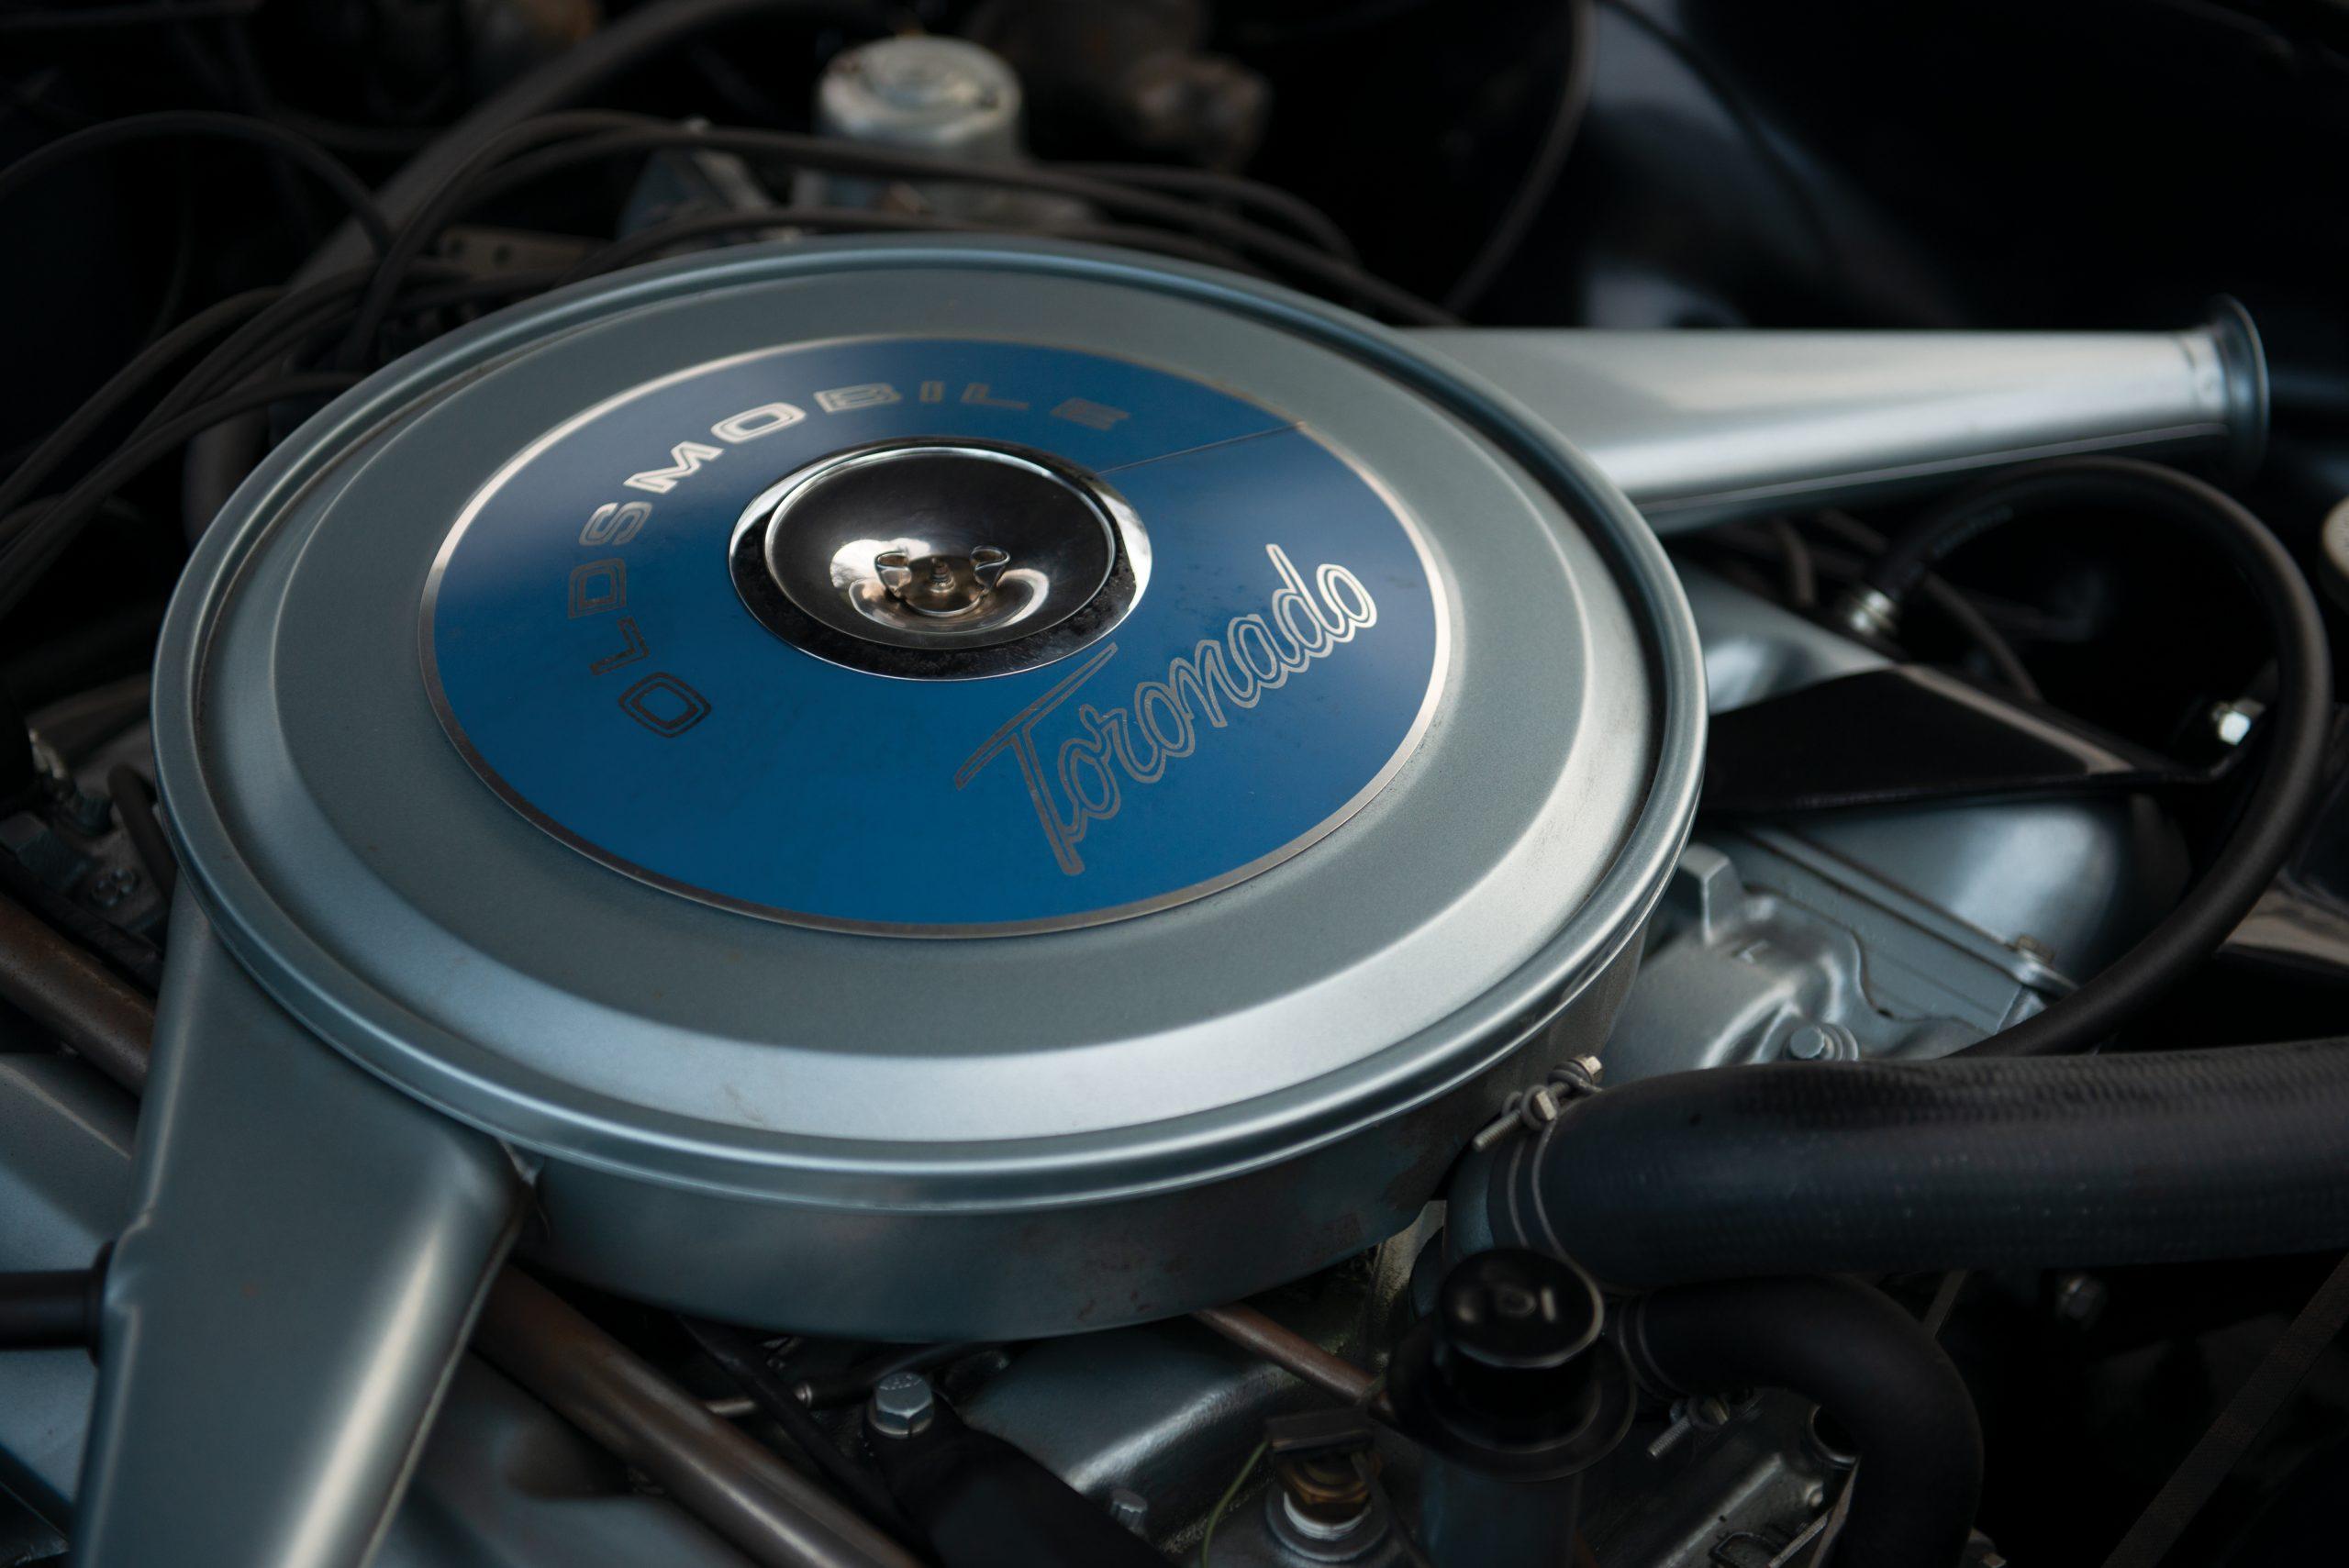 Olds Toronado engine air intake